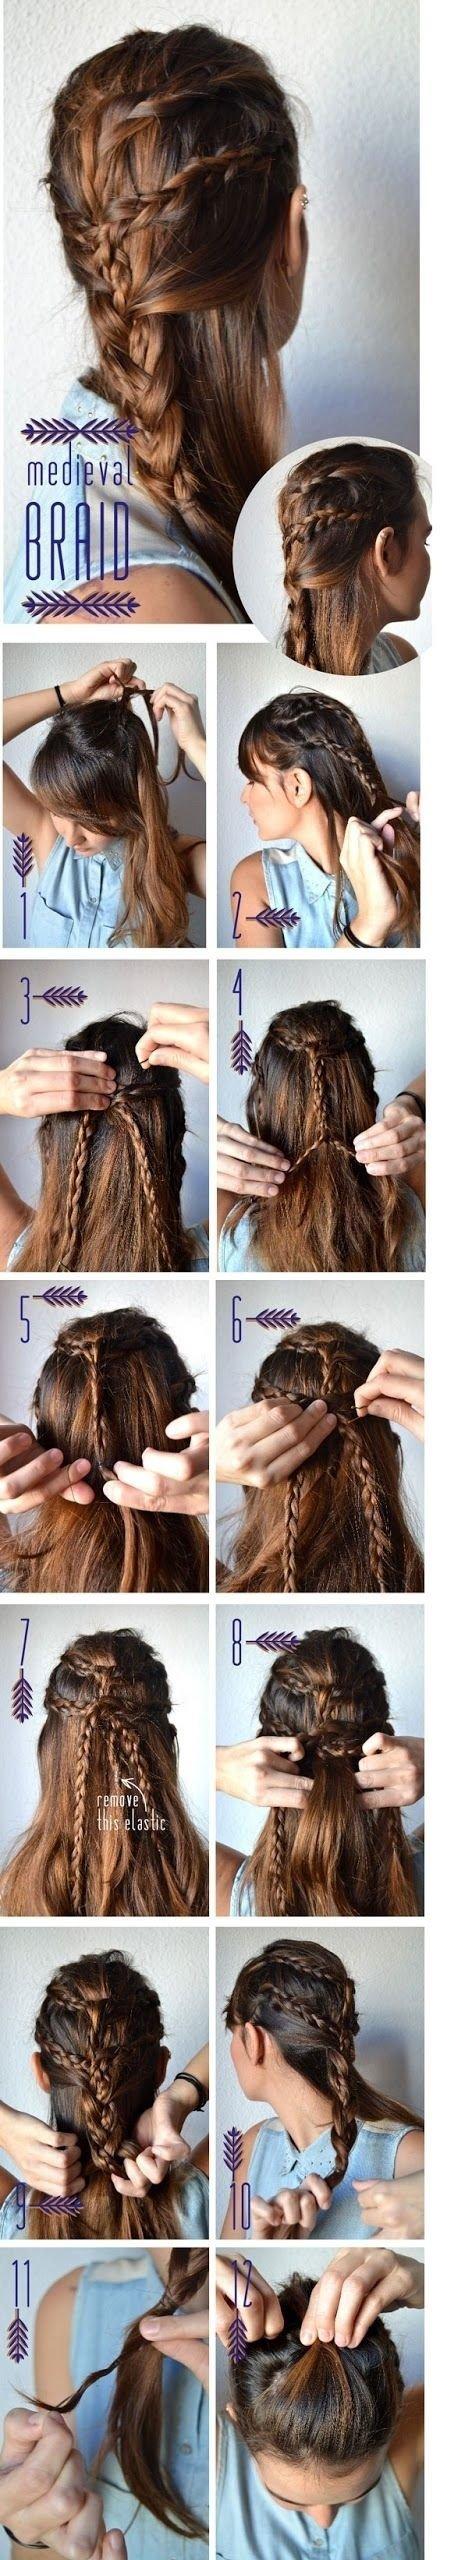 hair,hairstyle,brown,sense,collage,